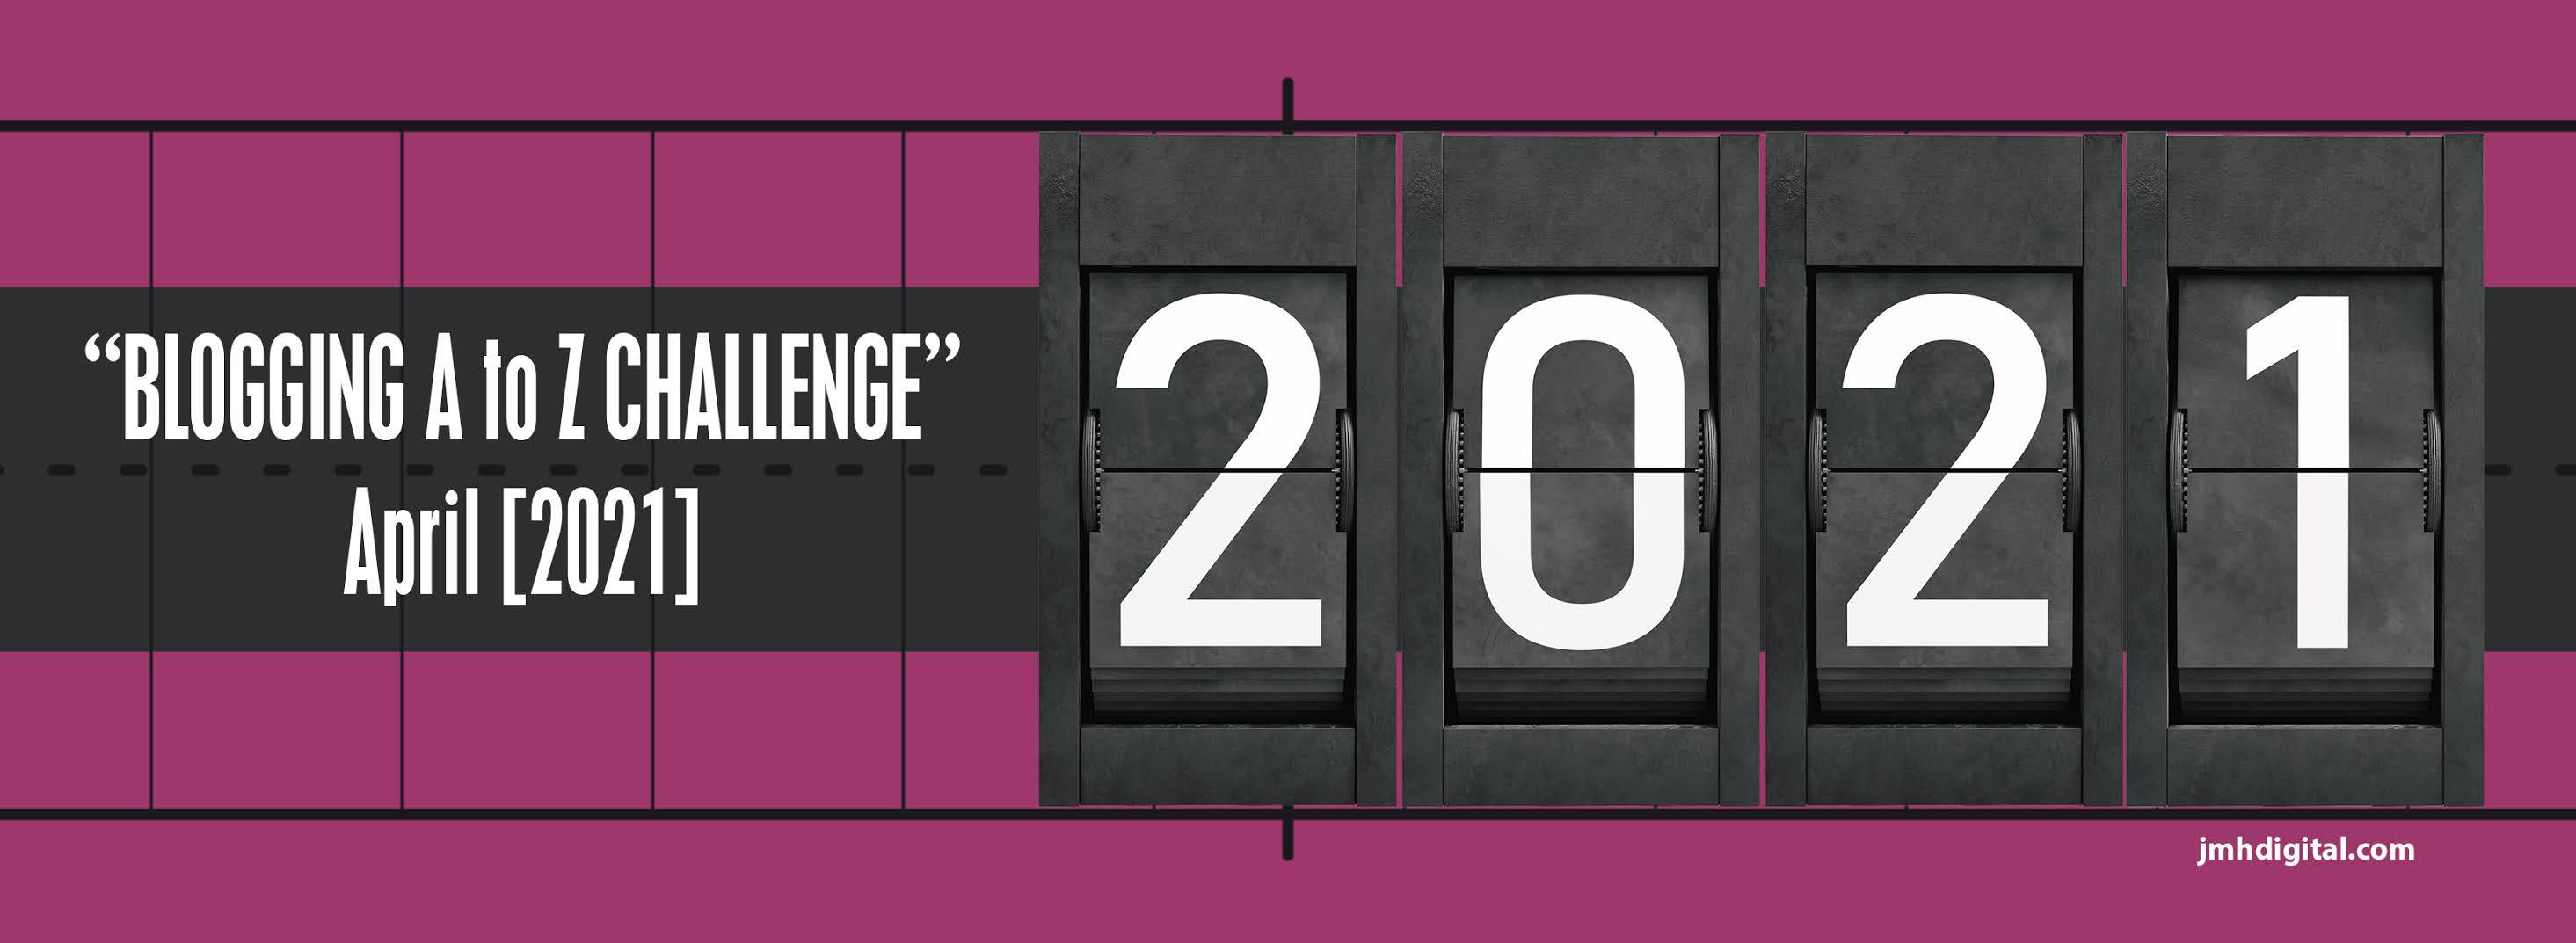 #AtoZChallenge 2021 banner